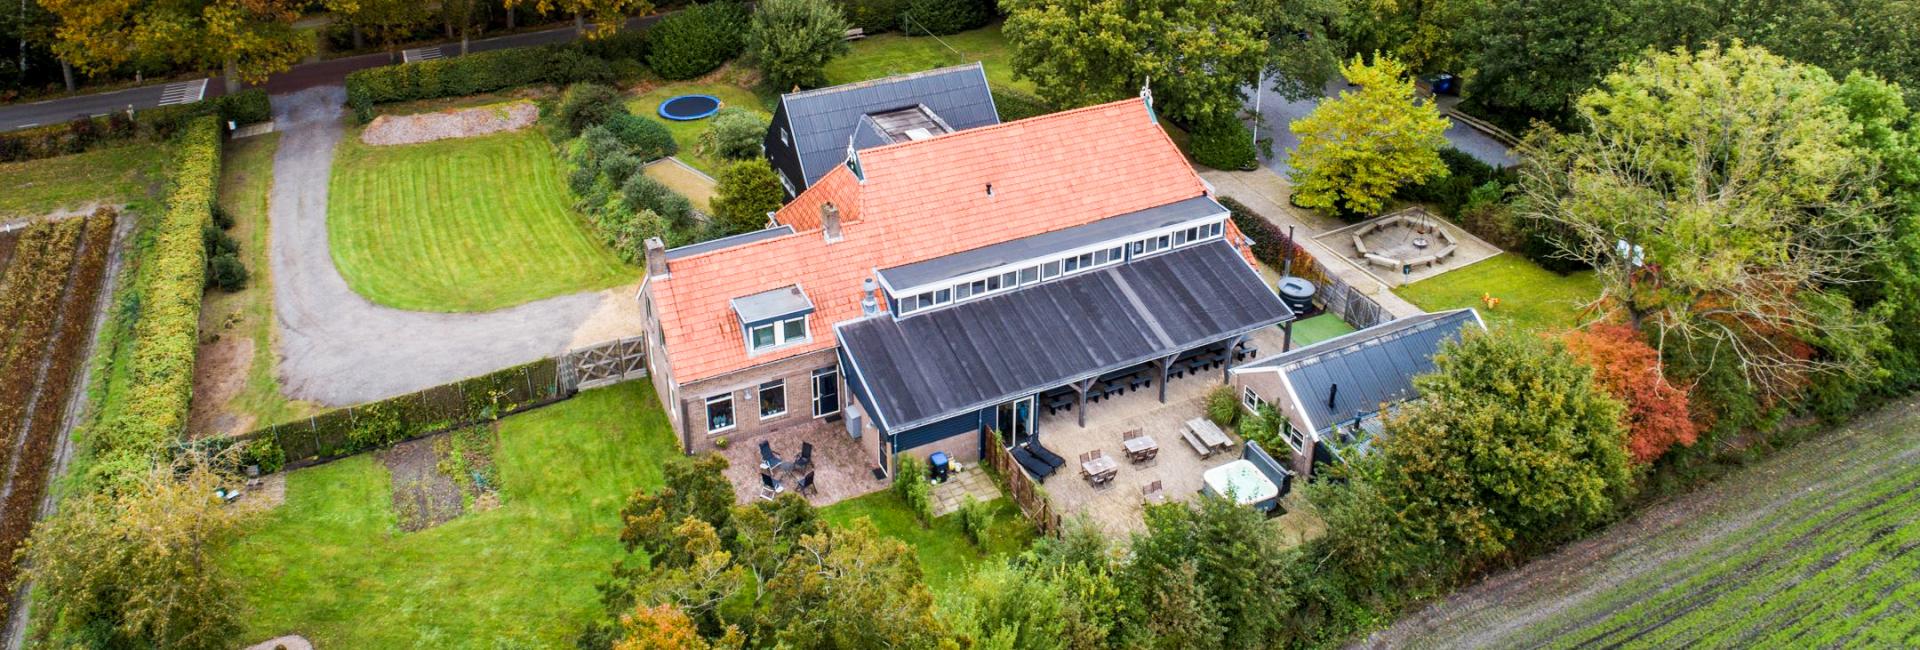 Groepsaccommodatie de Friese Ardennen